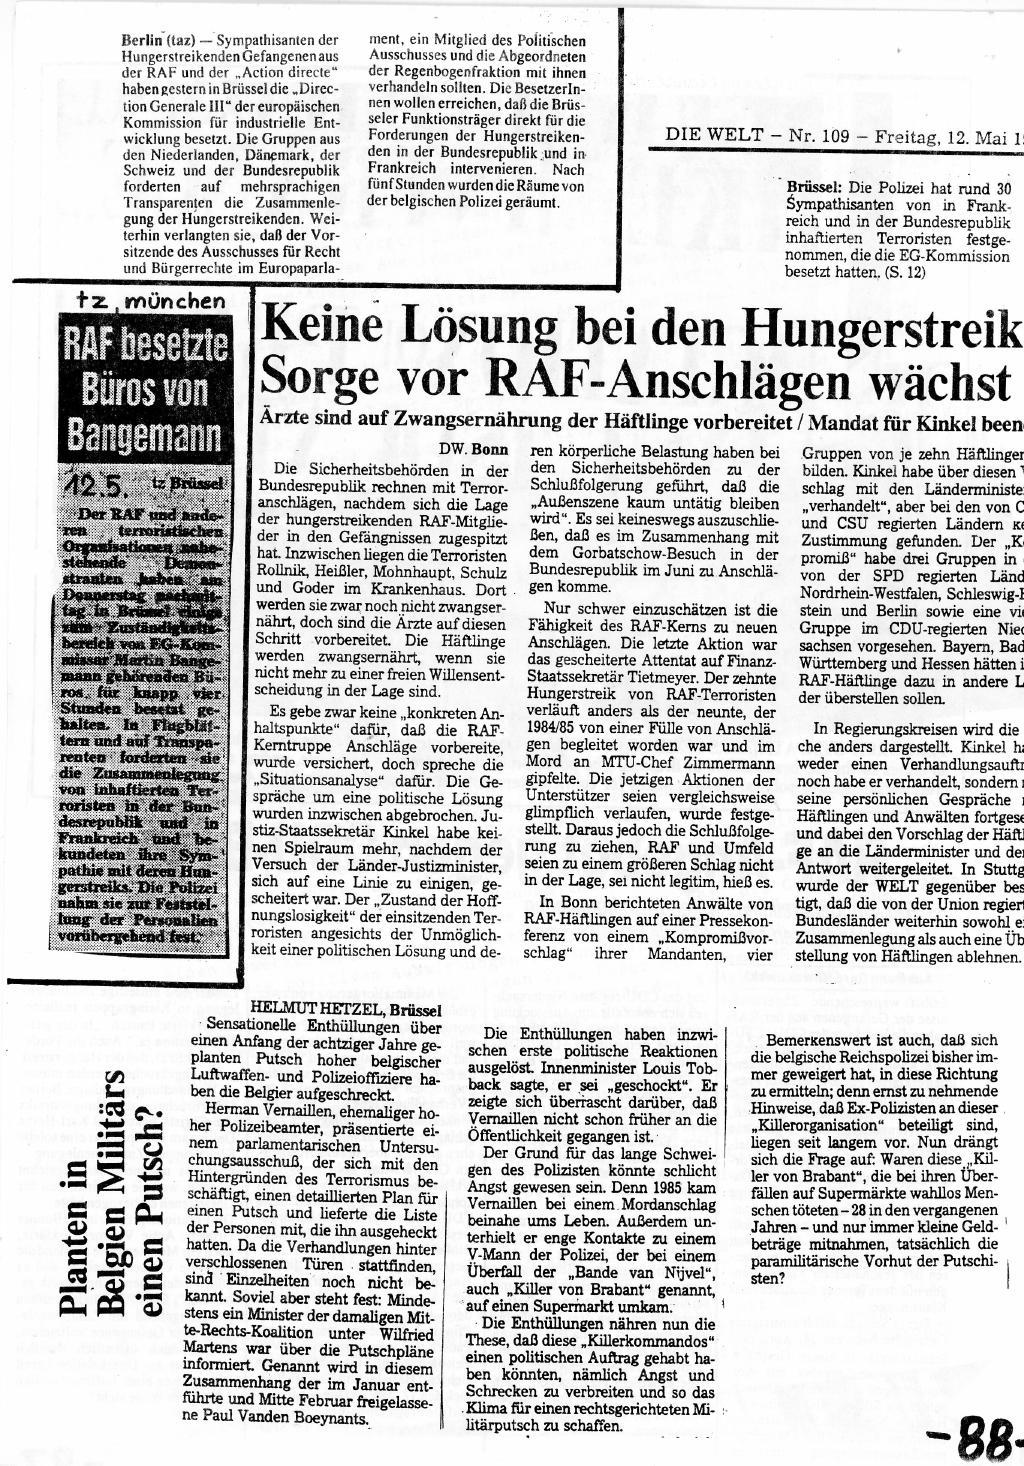 Belgien_Doku_Besetzung_EG_Kommission_1989_090